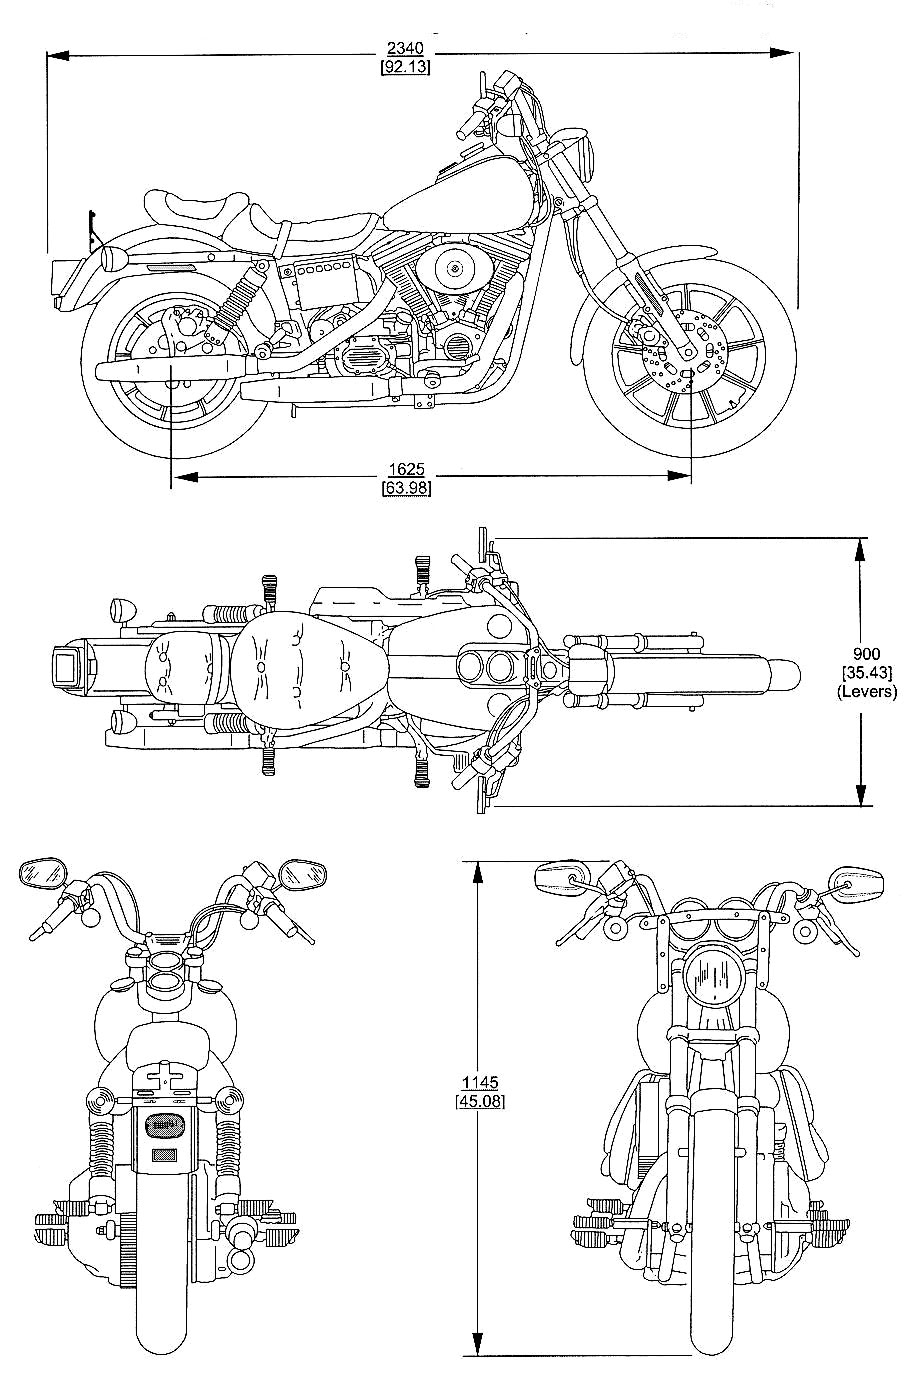 Harley-Davidson FS2 blueprint